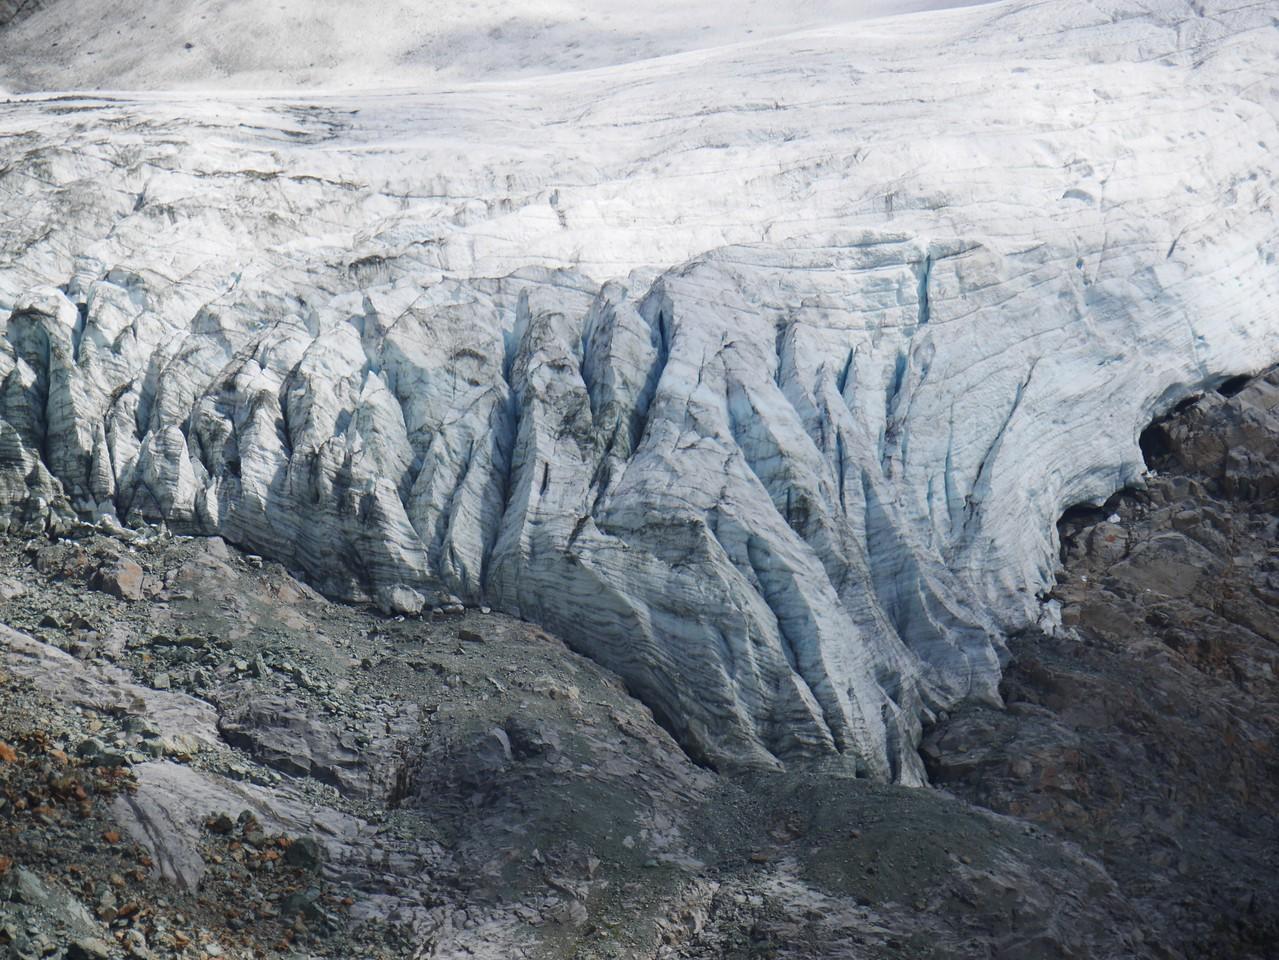 Lake Ann Hike - Mt Shuksan glaciers